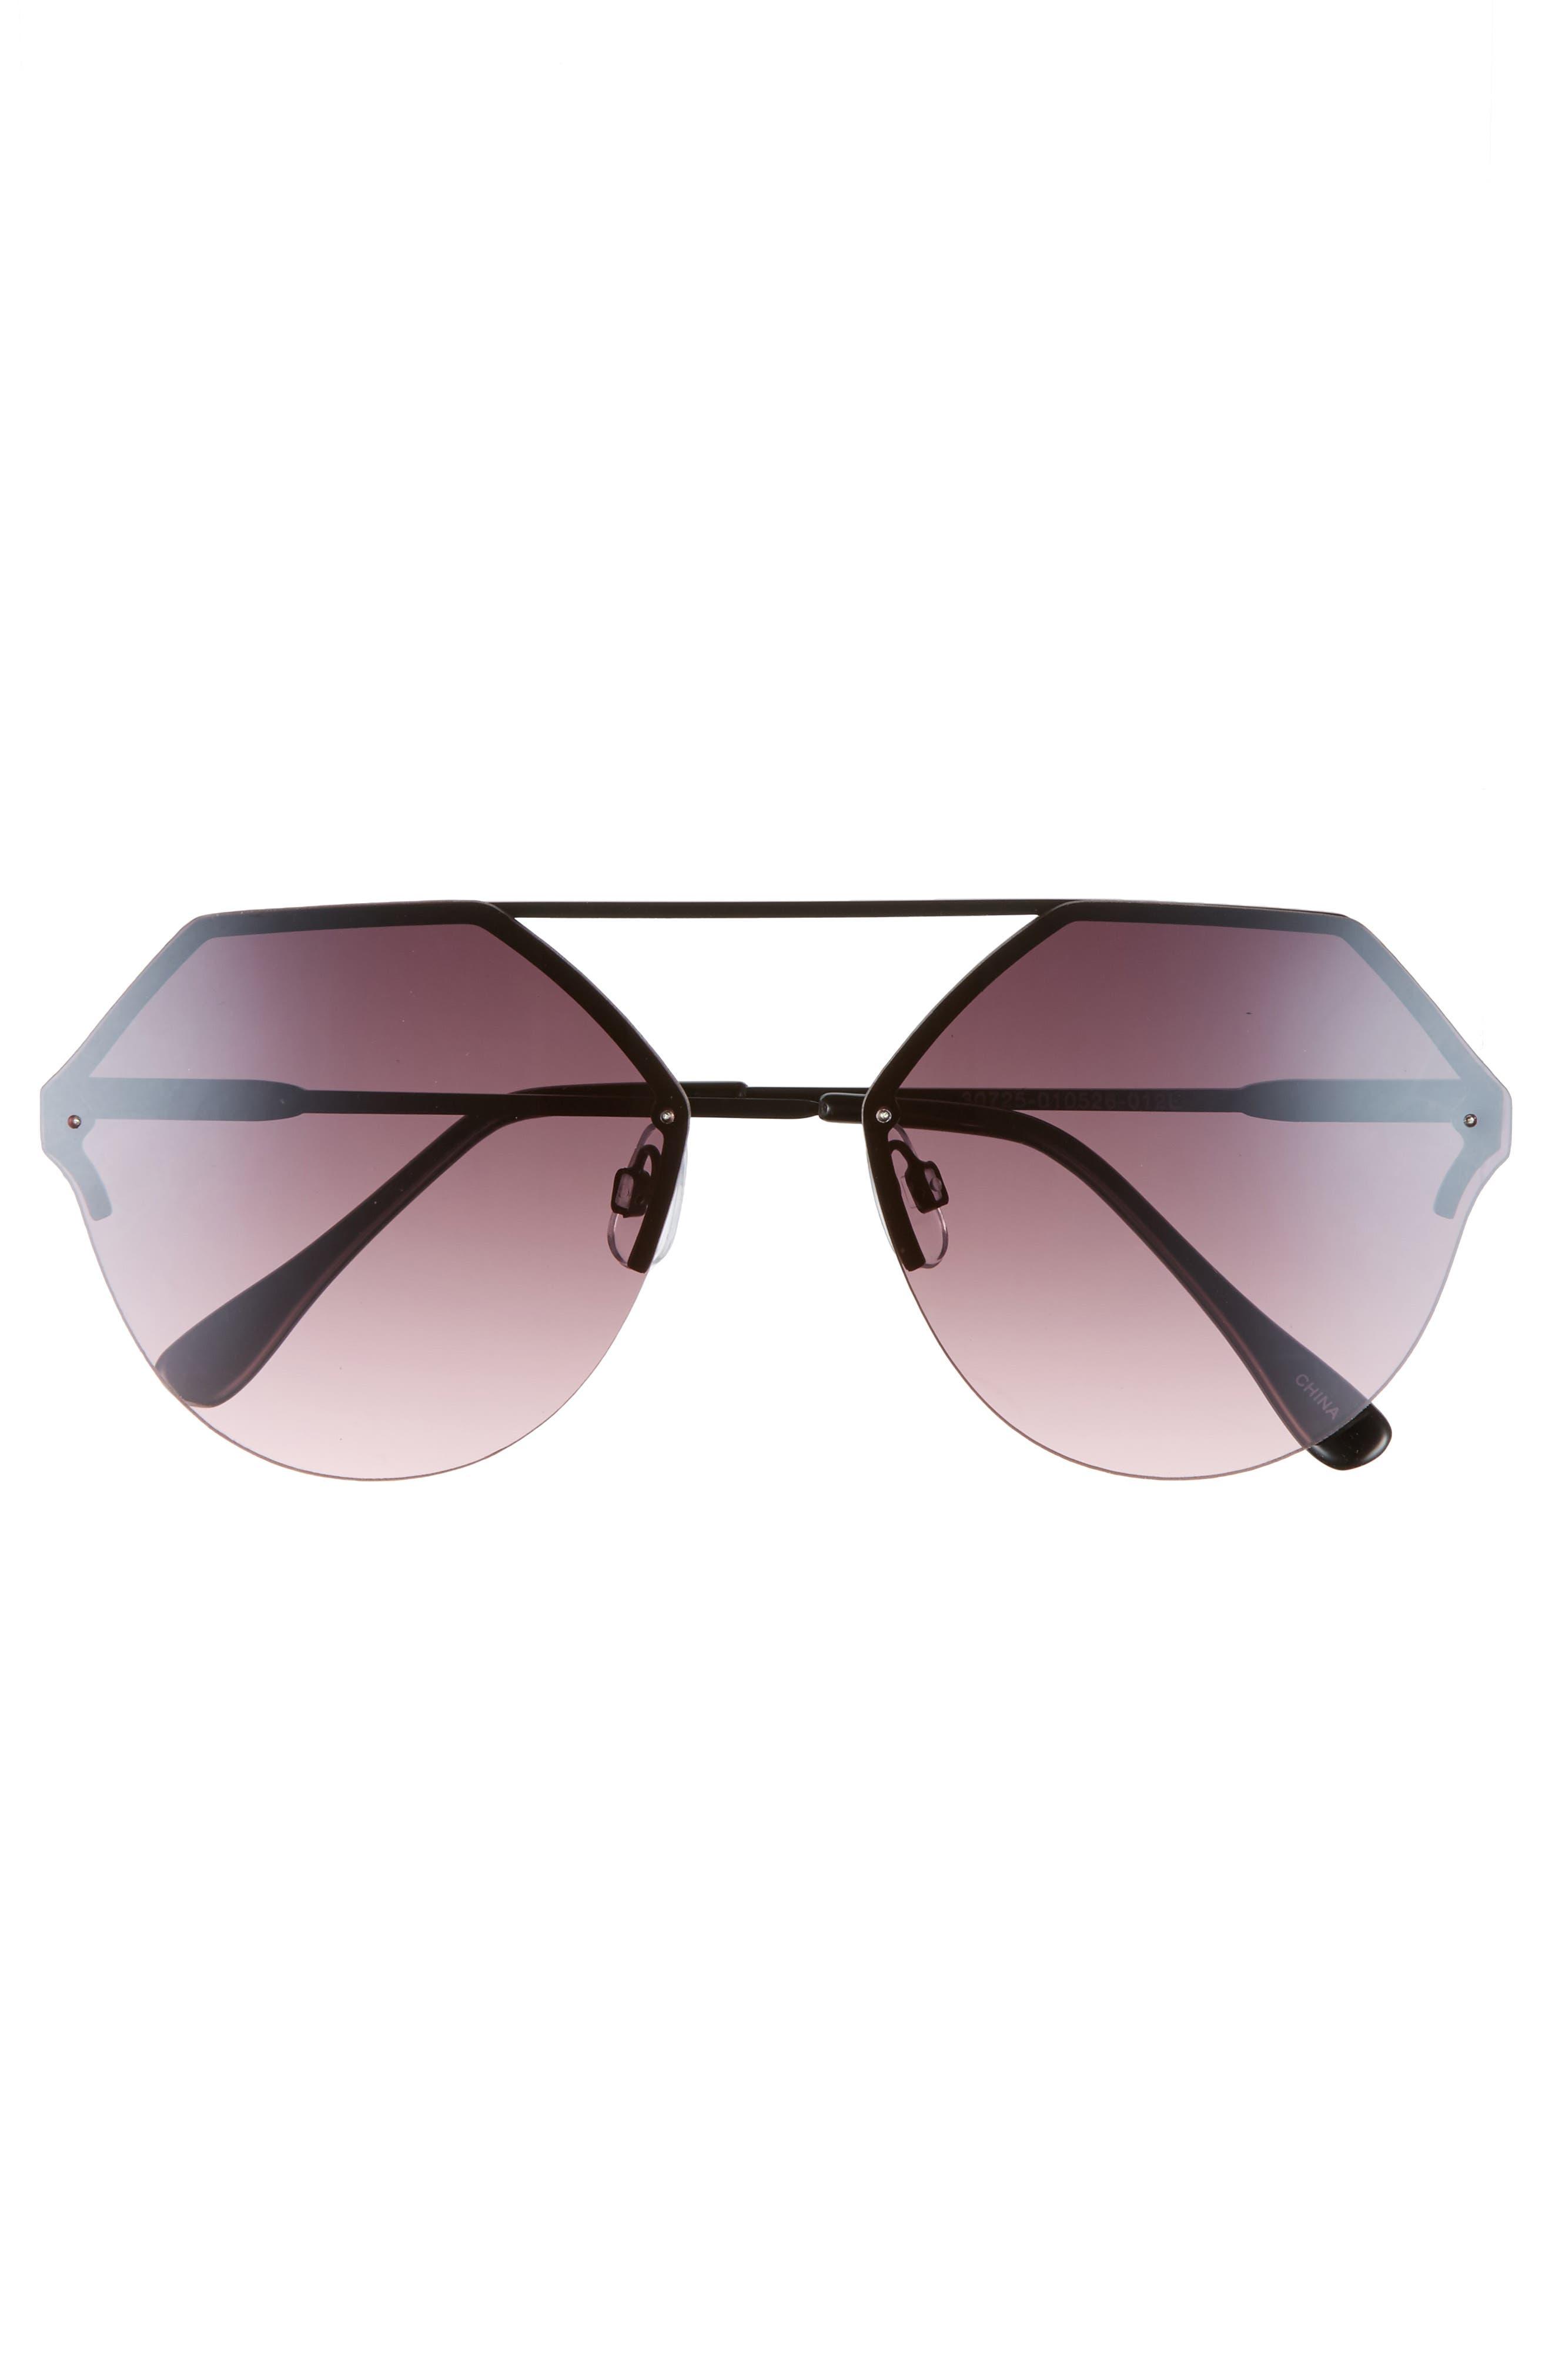 Metal Flat Brow Bar Geometric Sunglasses,                             Alternate thumbnail 3, color,                             Black